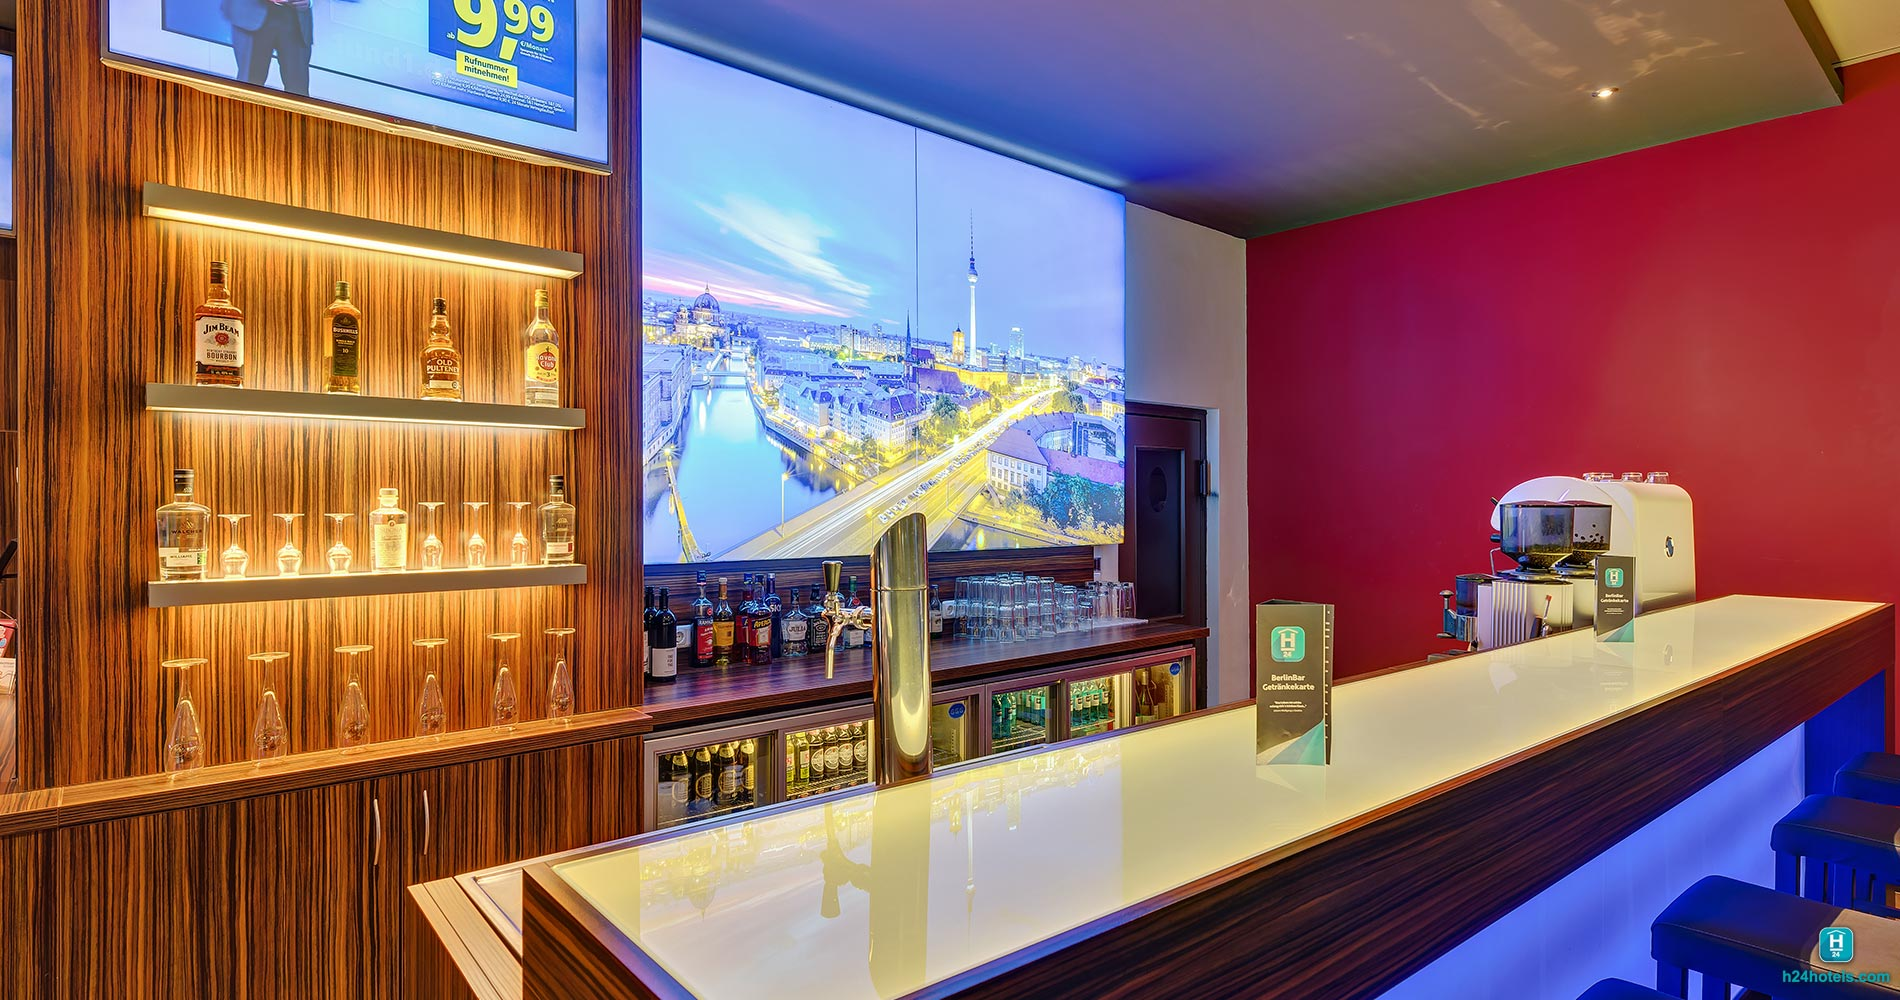 H24, Hoteltow Bar, Lounge, Drinks, Evening, Afterwork, Cocktail, Longdrink